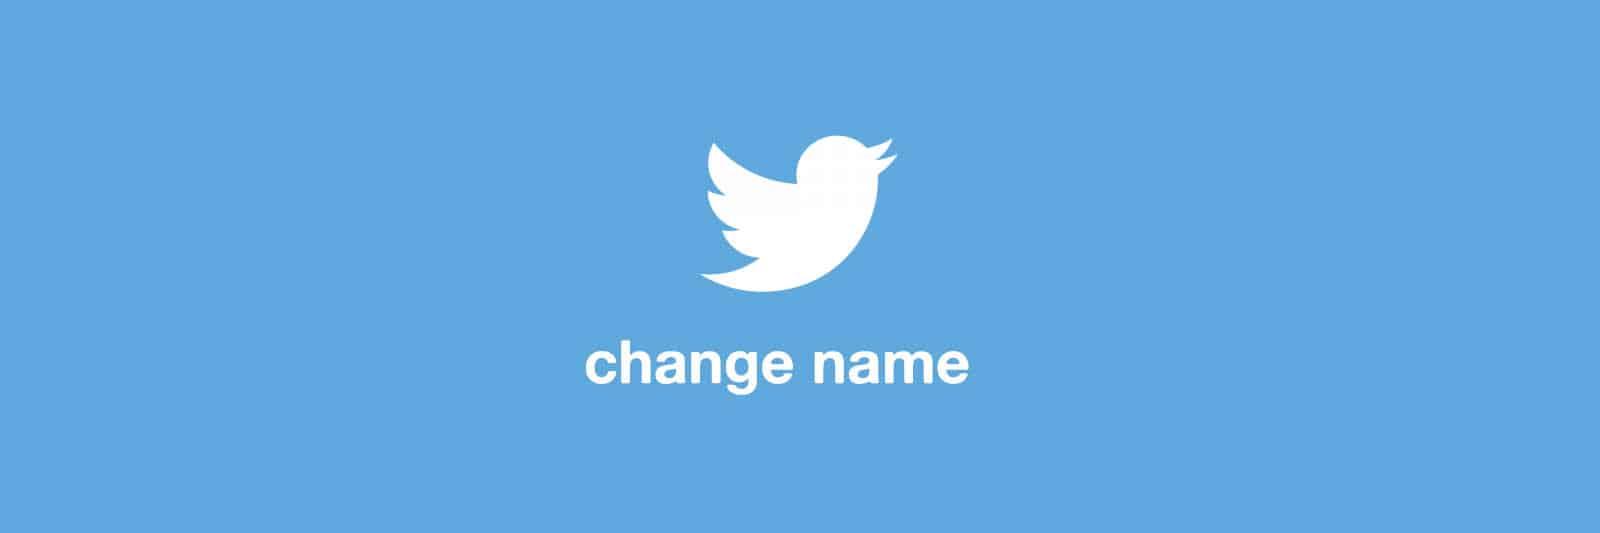 change-name-twitter